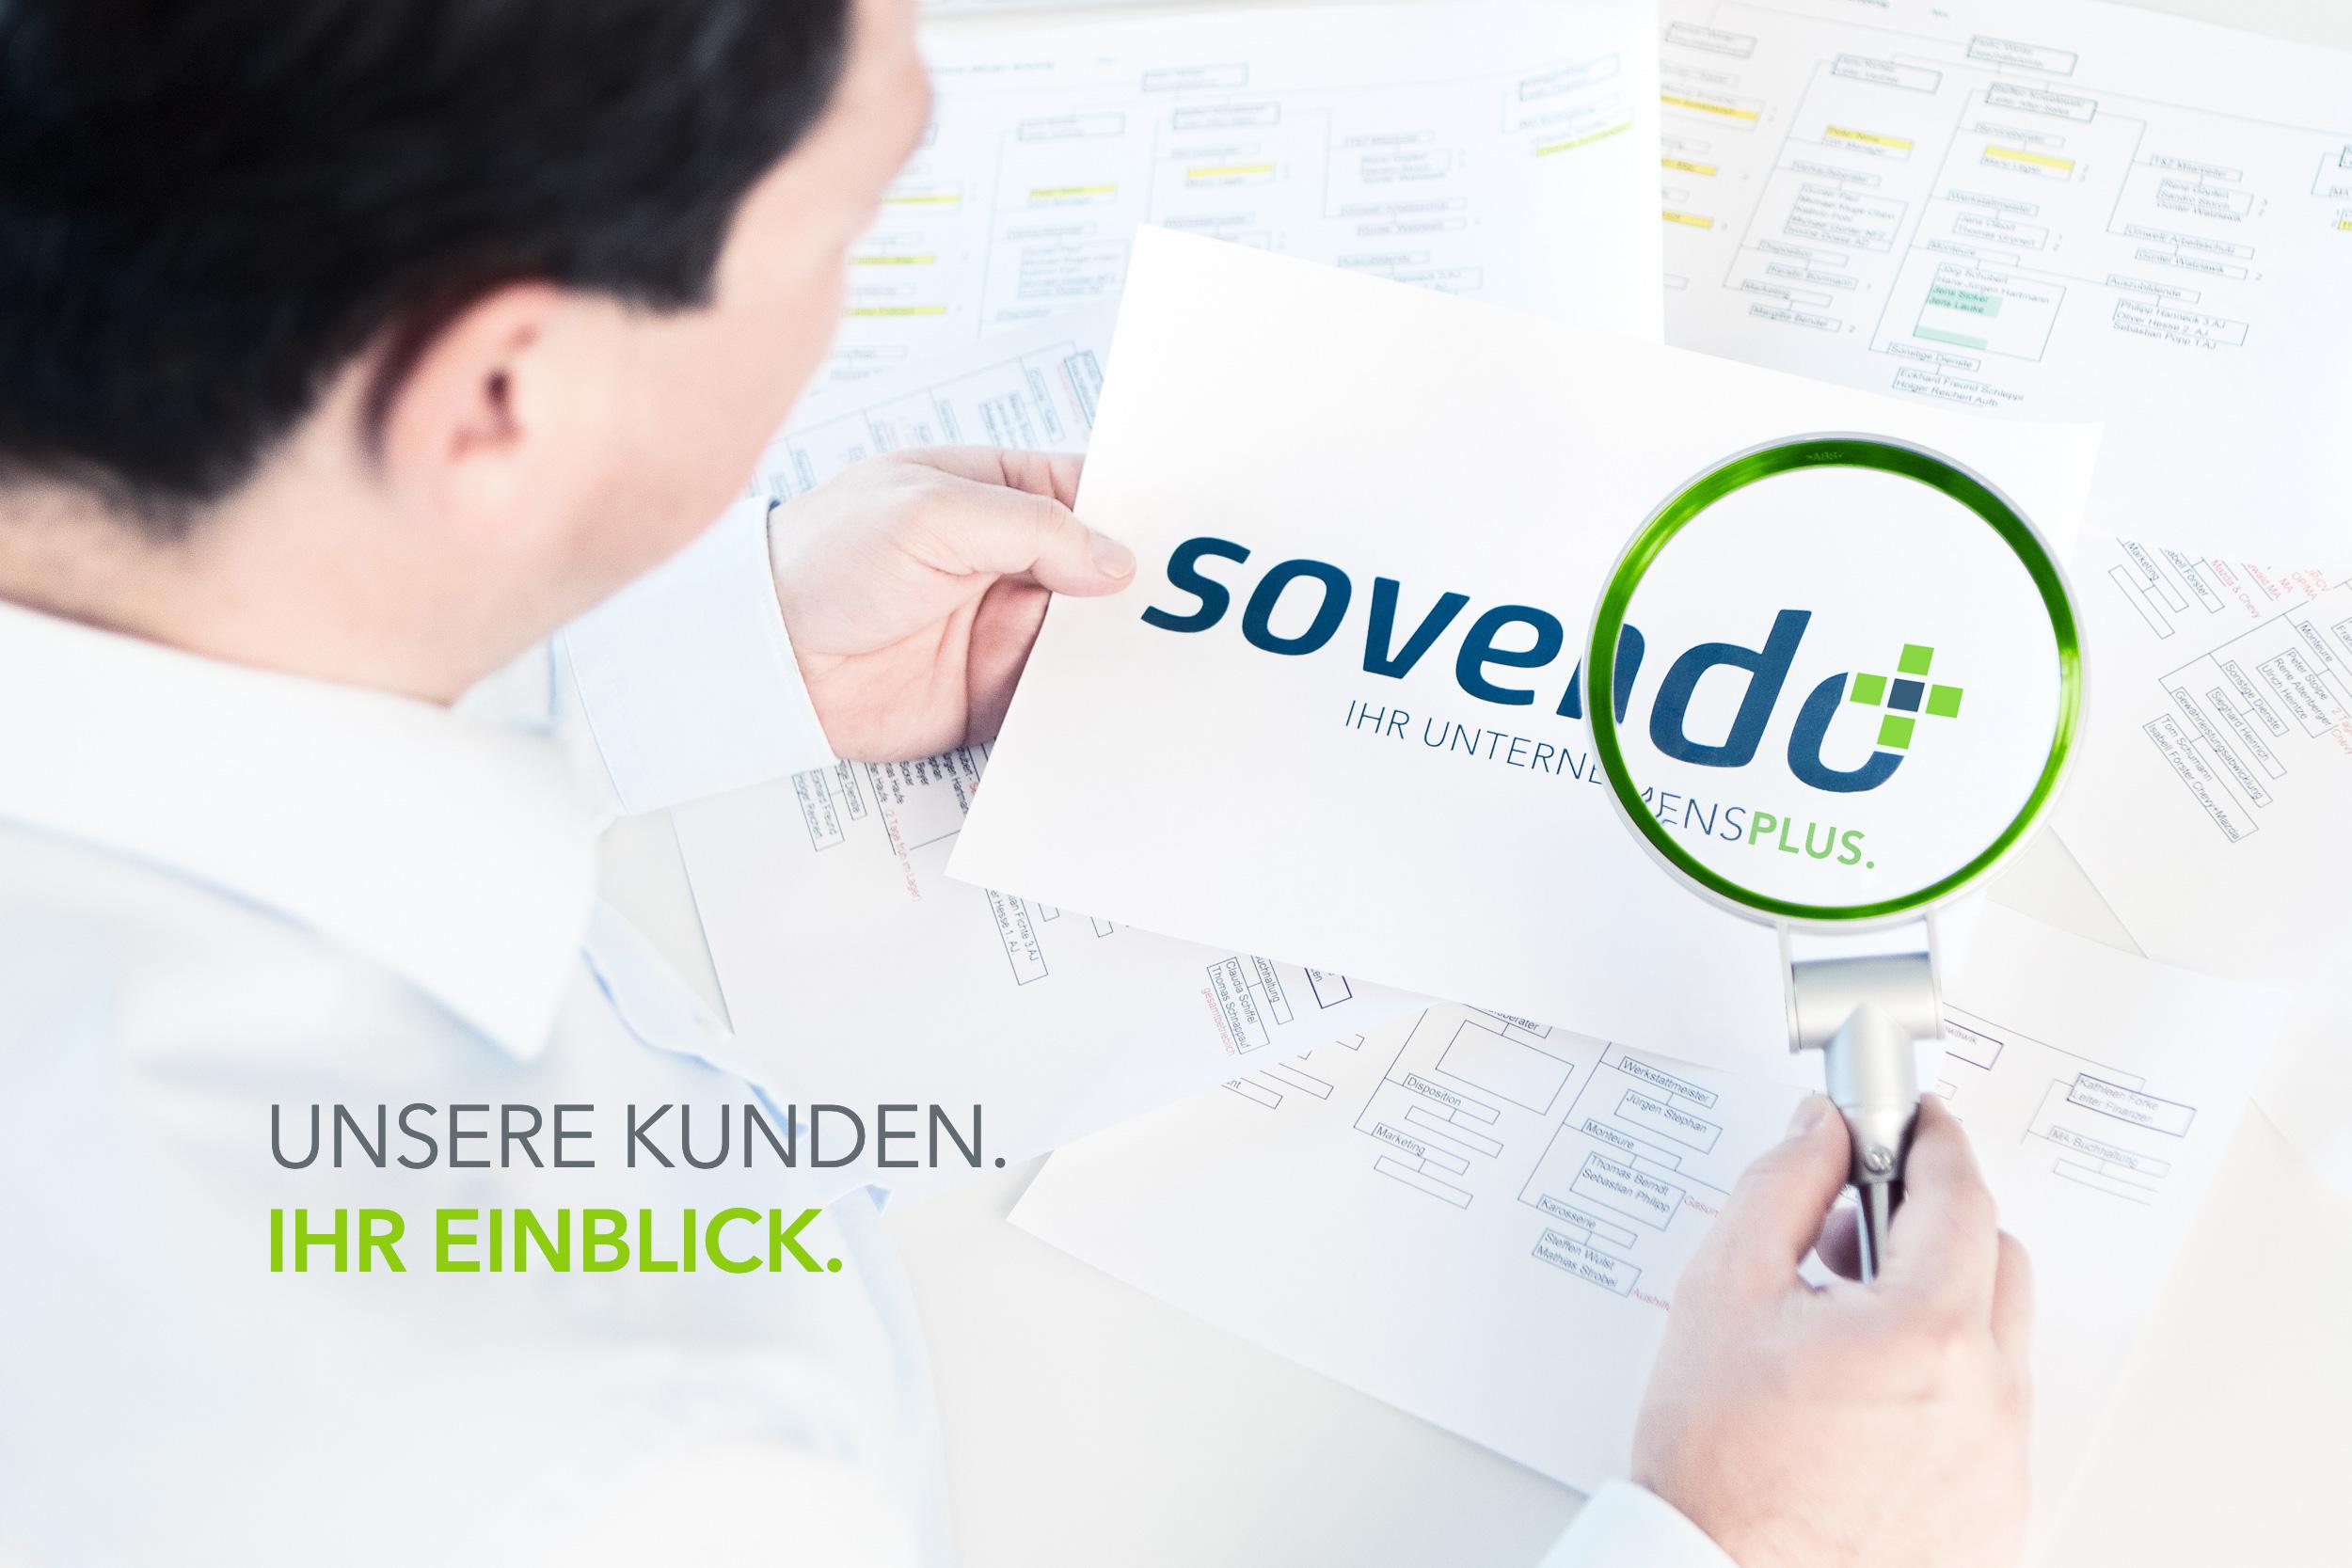 SOVENDO | Ihr UnternehmensPLUS | Coaching